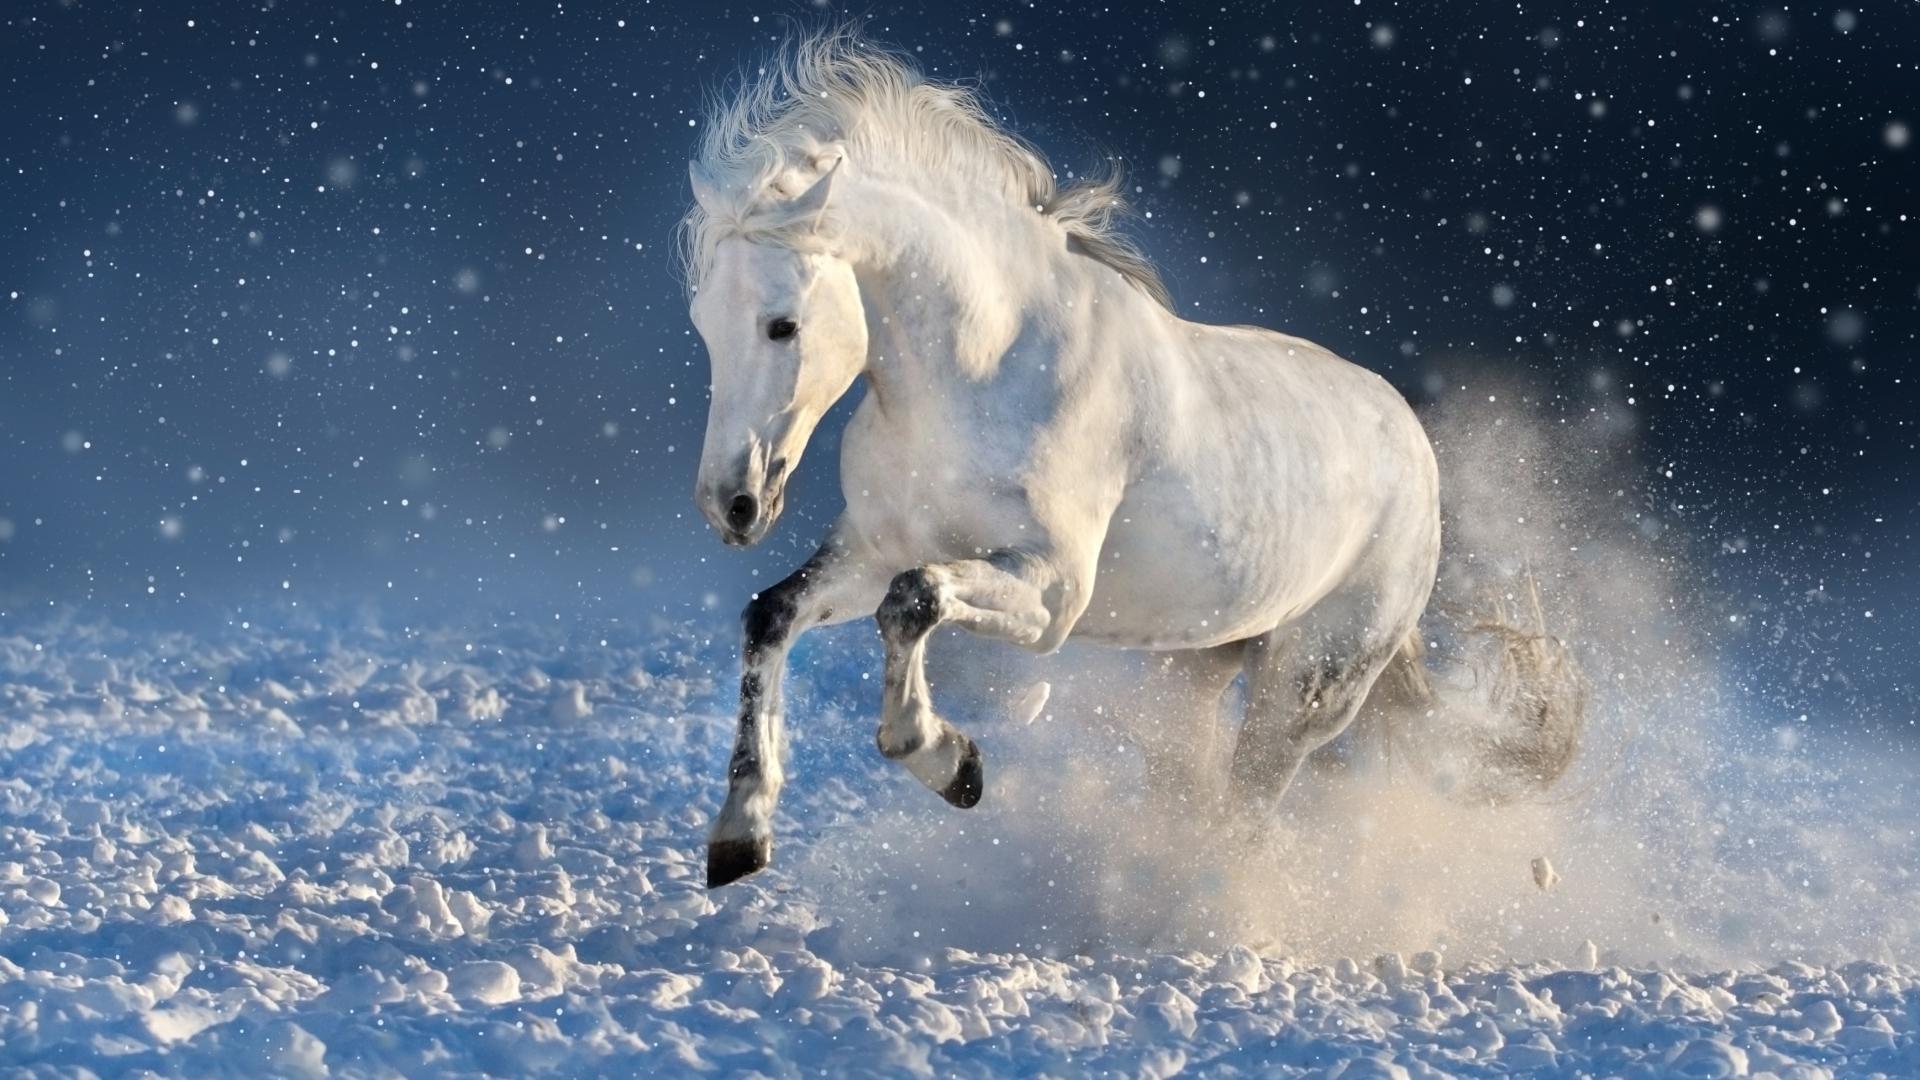 Download 1920x1080 Wallpaper White Horse Run Mammal Portrait